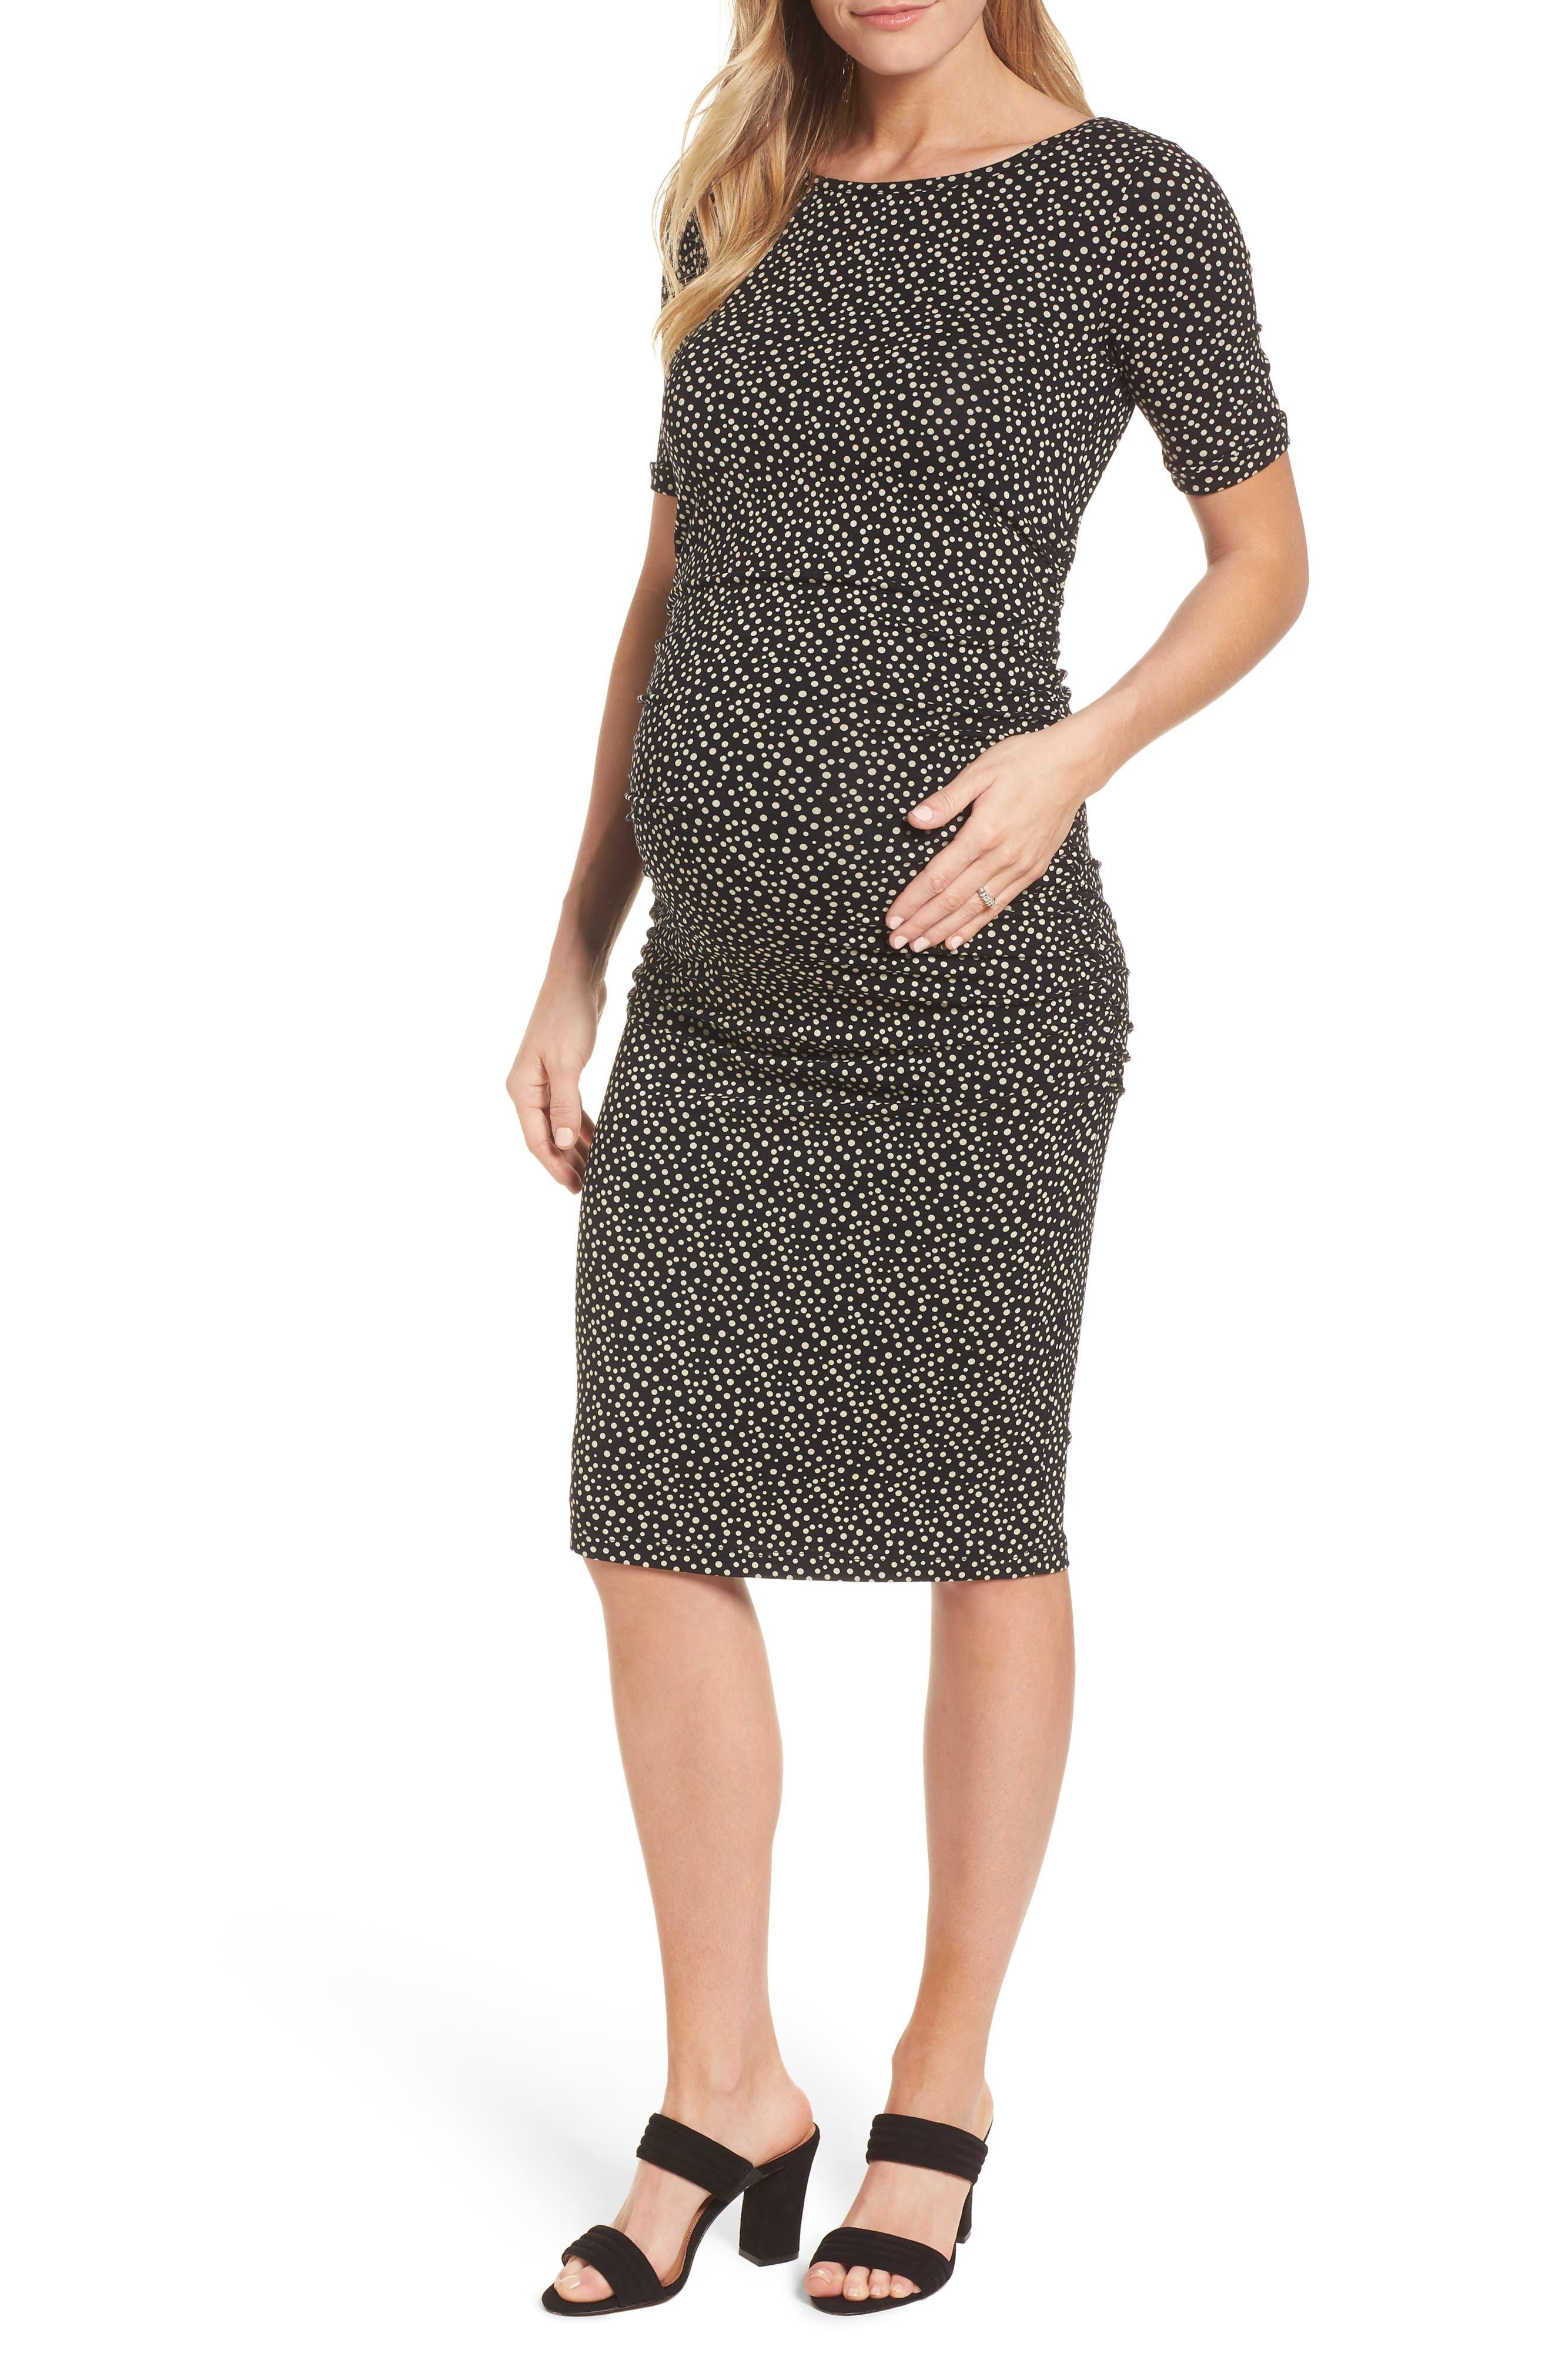 Isabella Oliver Danni Ruched Maternity Dress